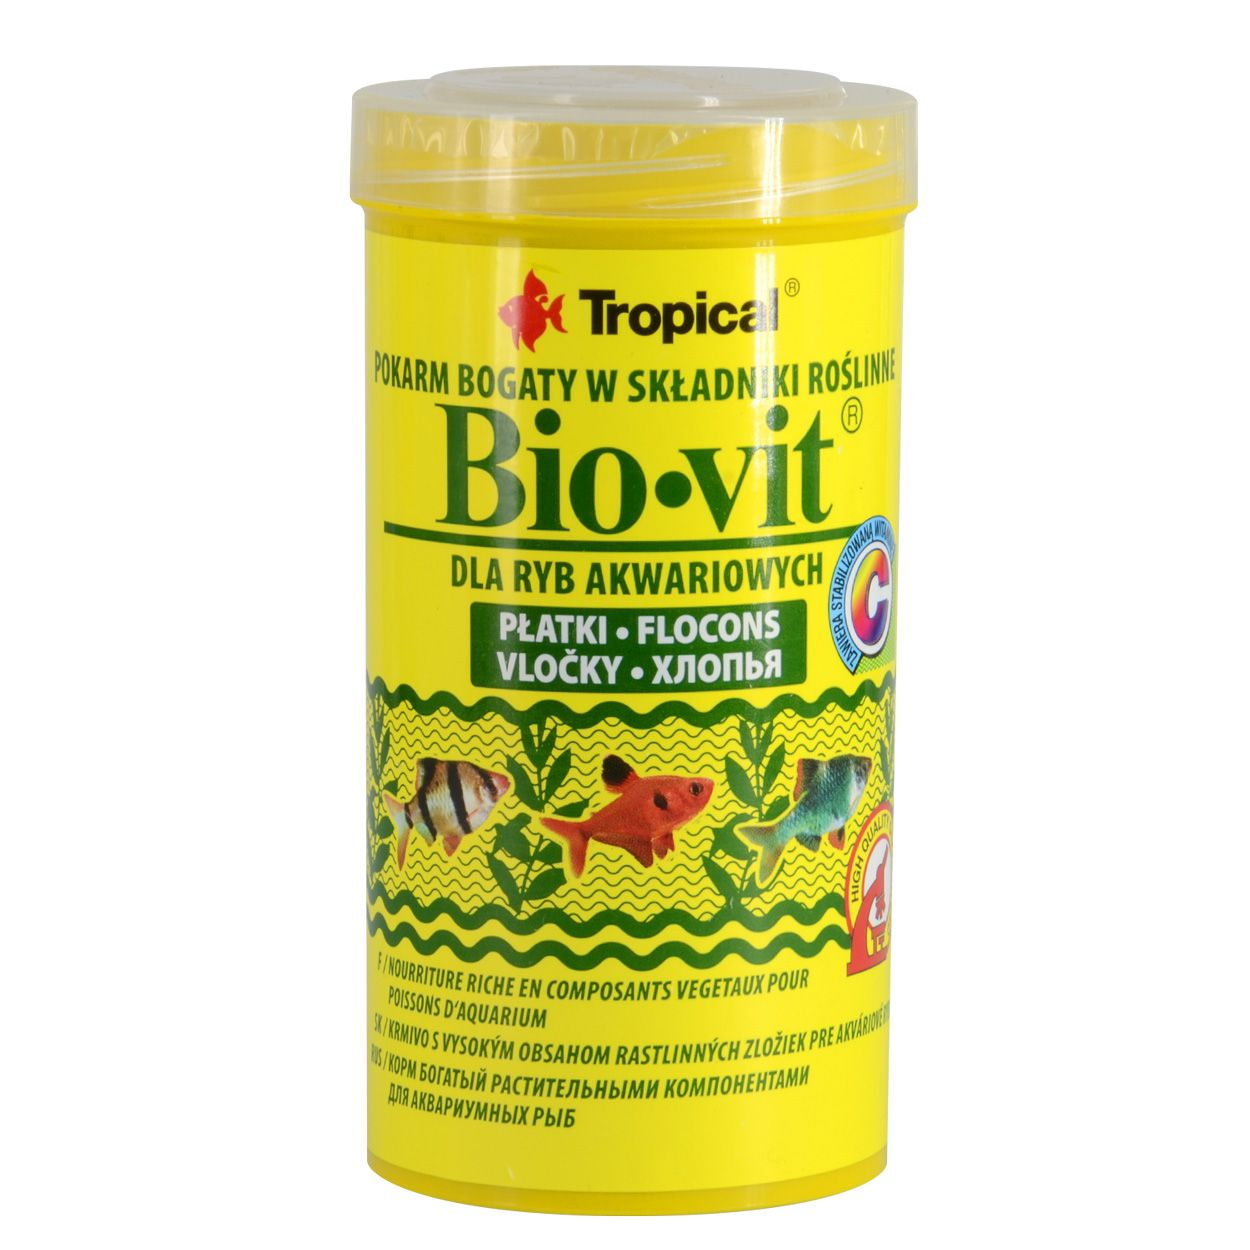 Tropical Flocos Bio Vit  50g - Alimento Vegetal para Peixes